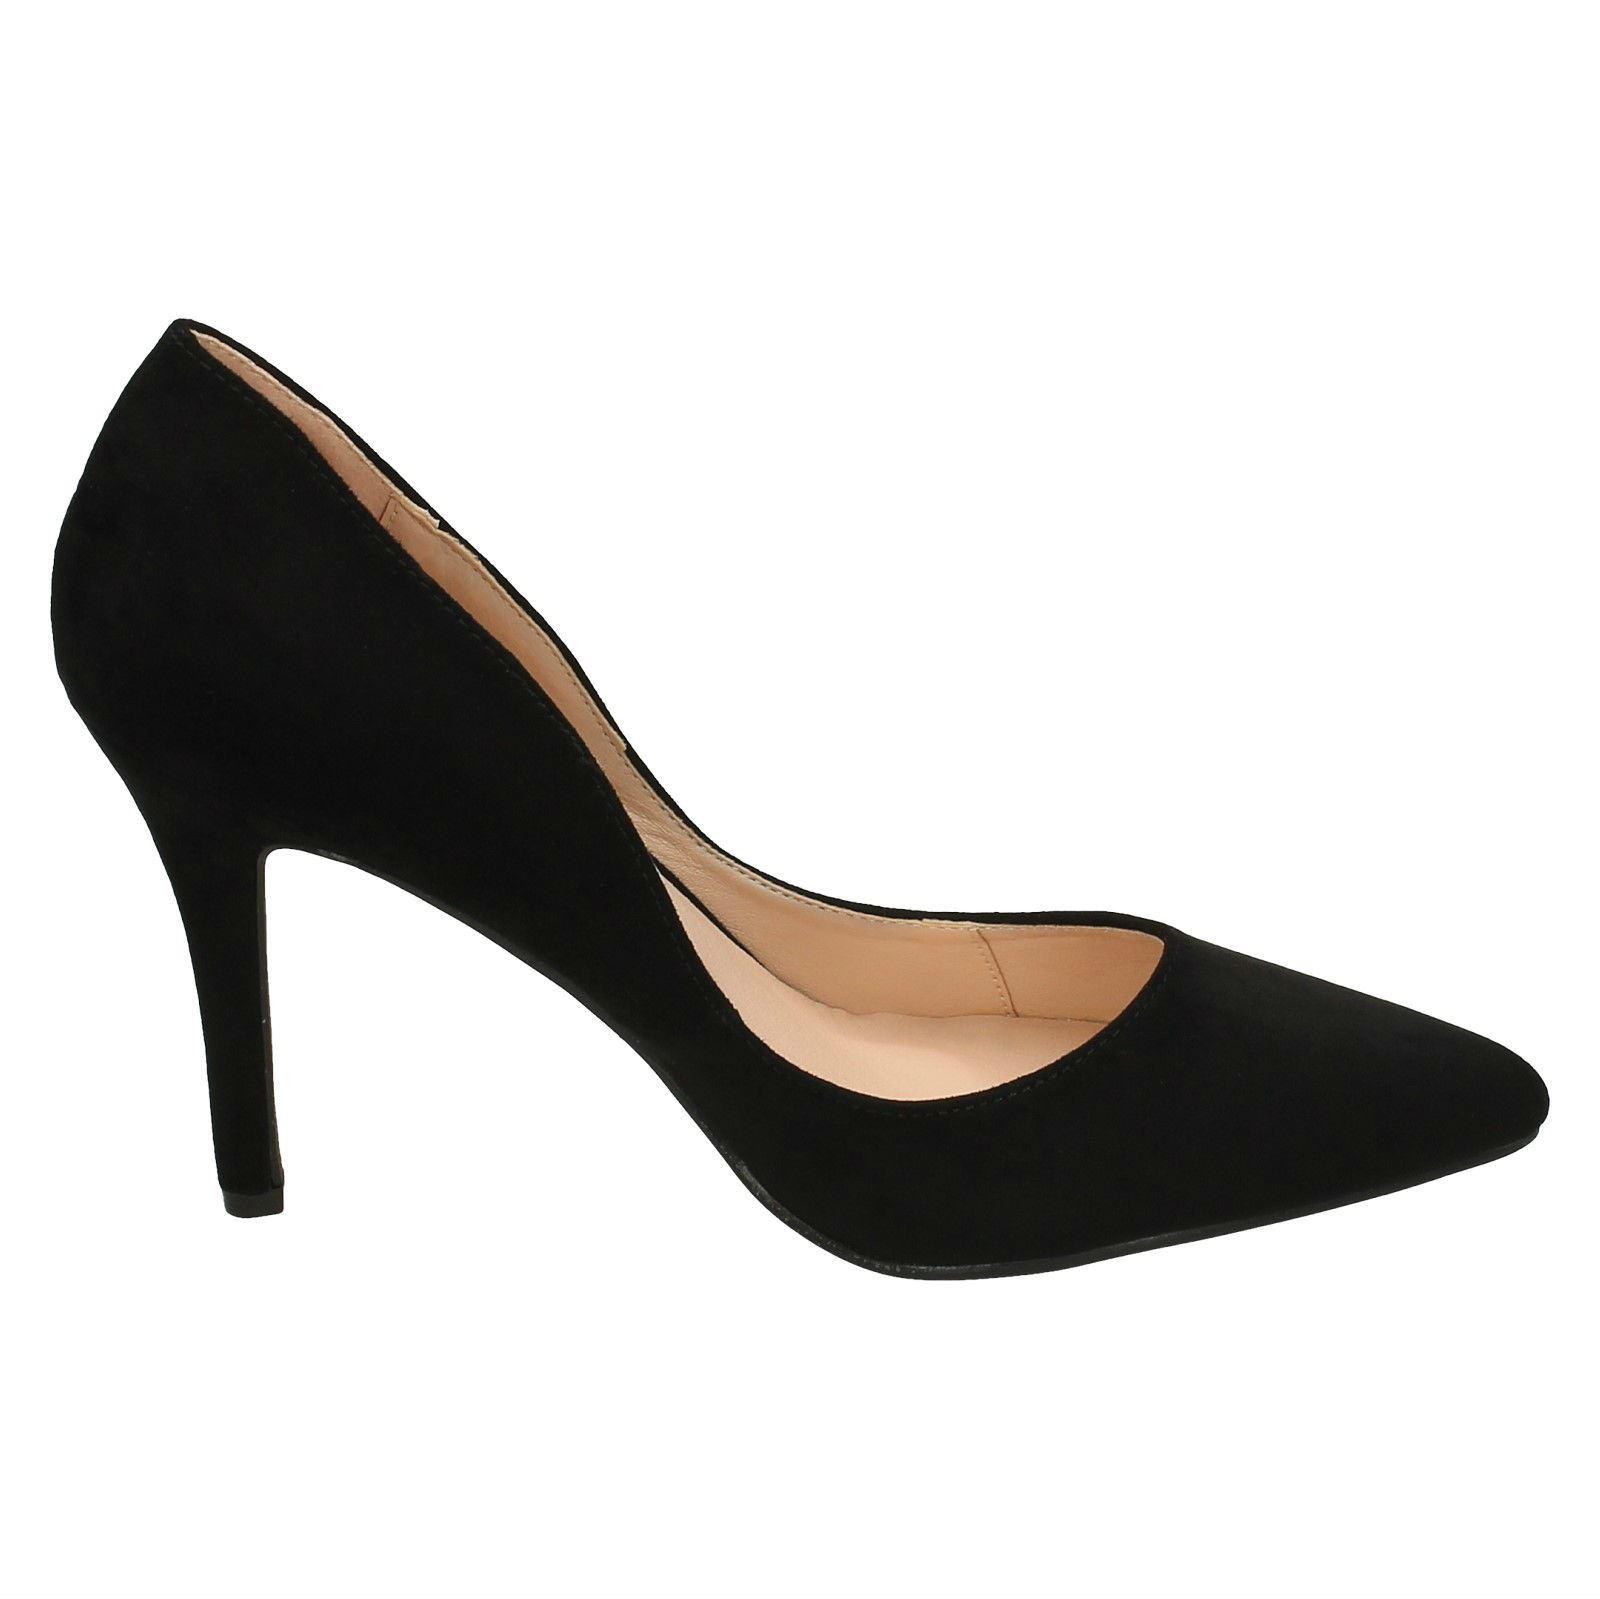 Ladies Anne Michelle High Heel /'Court Shoes/'